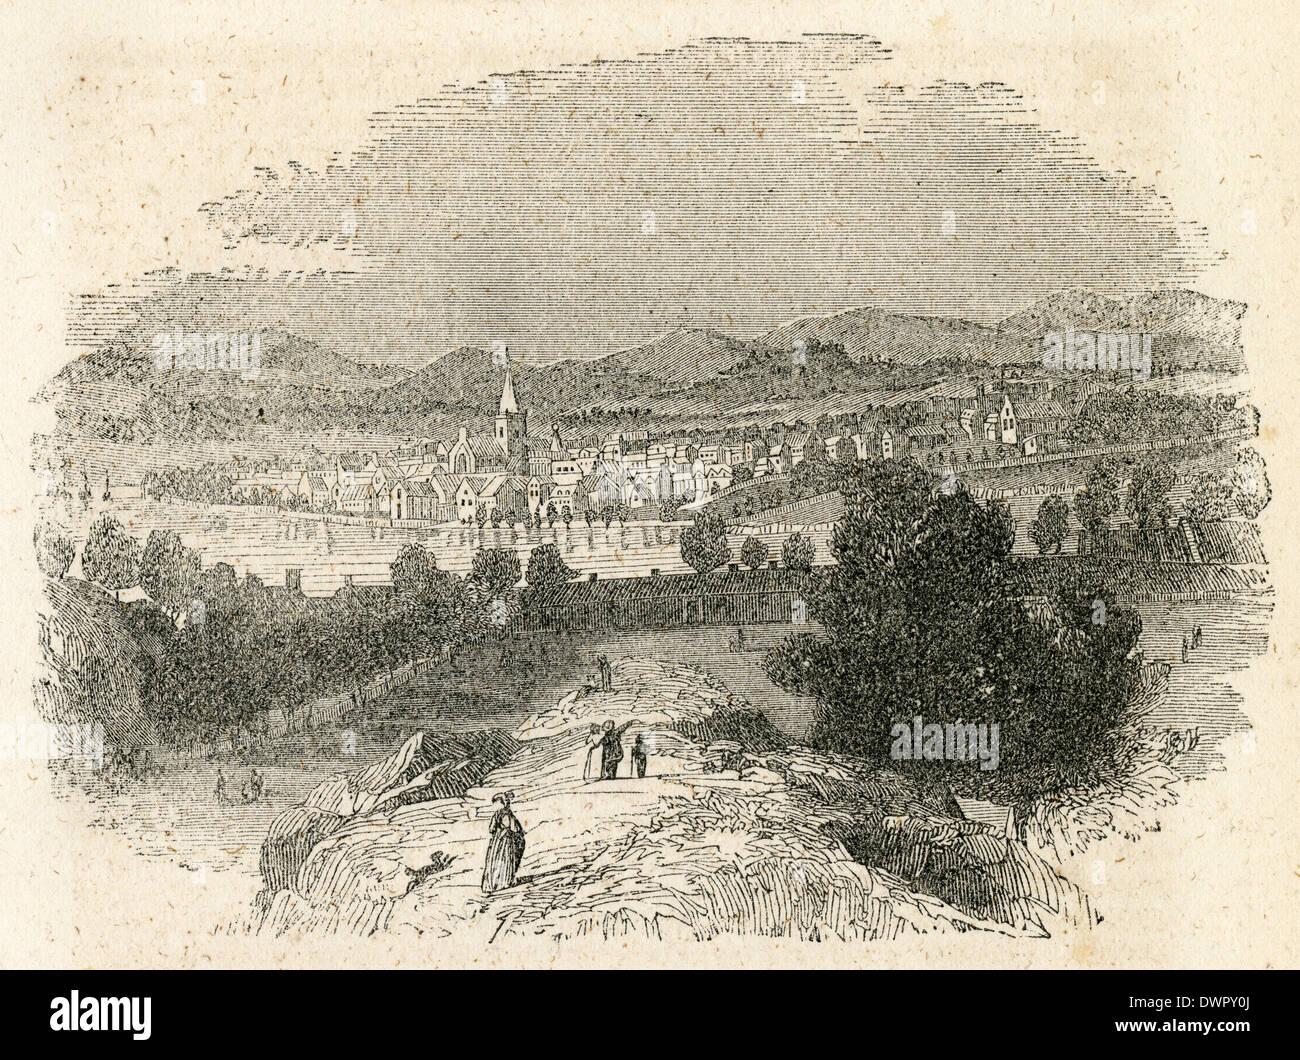 Circa 1860 antique engraving, view of Perth, Scotland. - Stock Image